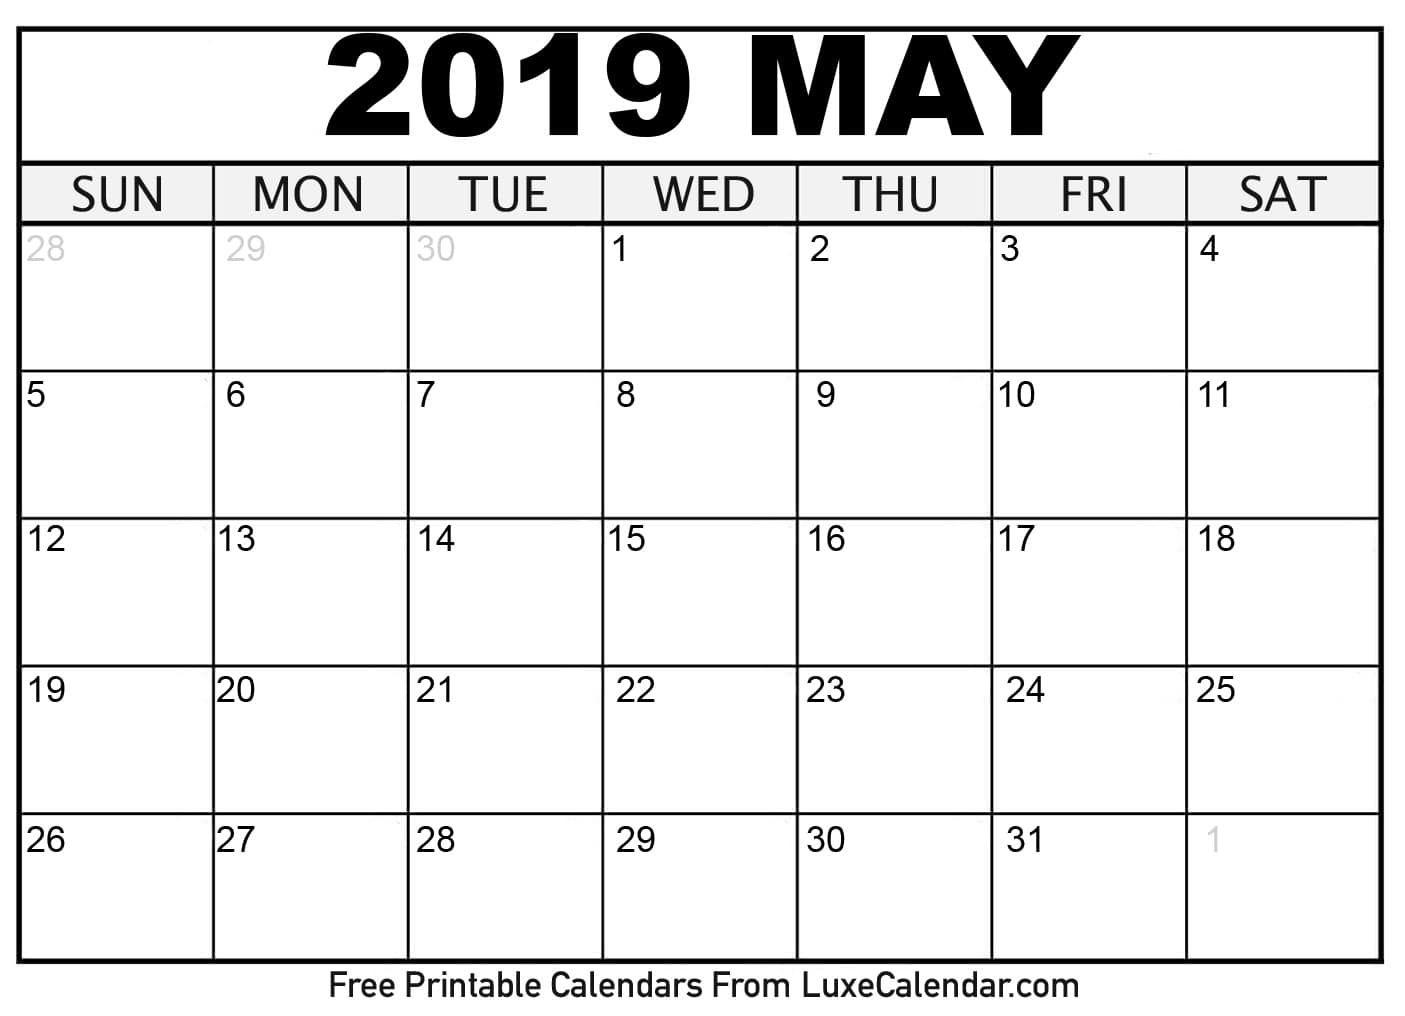 2019 May Calendar Printable   Printable Monthly Calendar Templates regarding Free Printable September Blank Calendars With Christian Themes